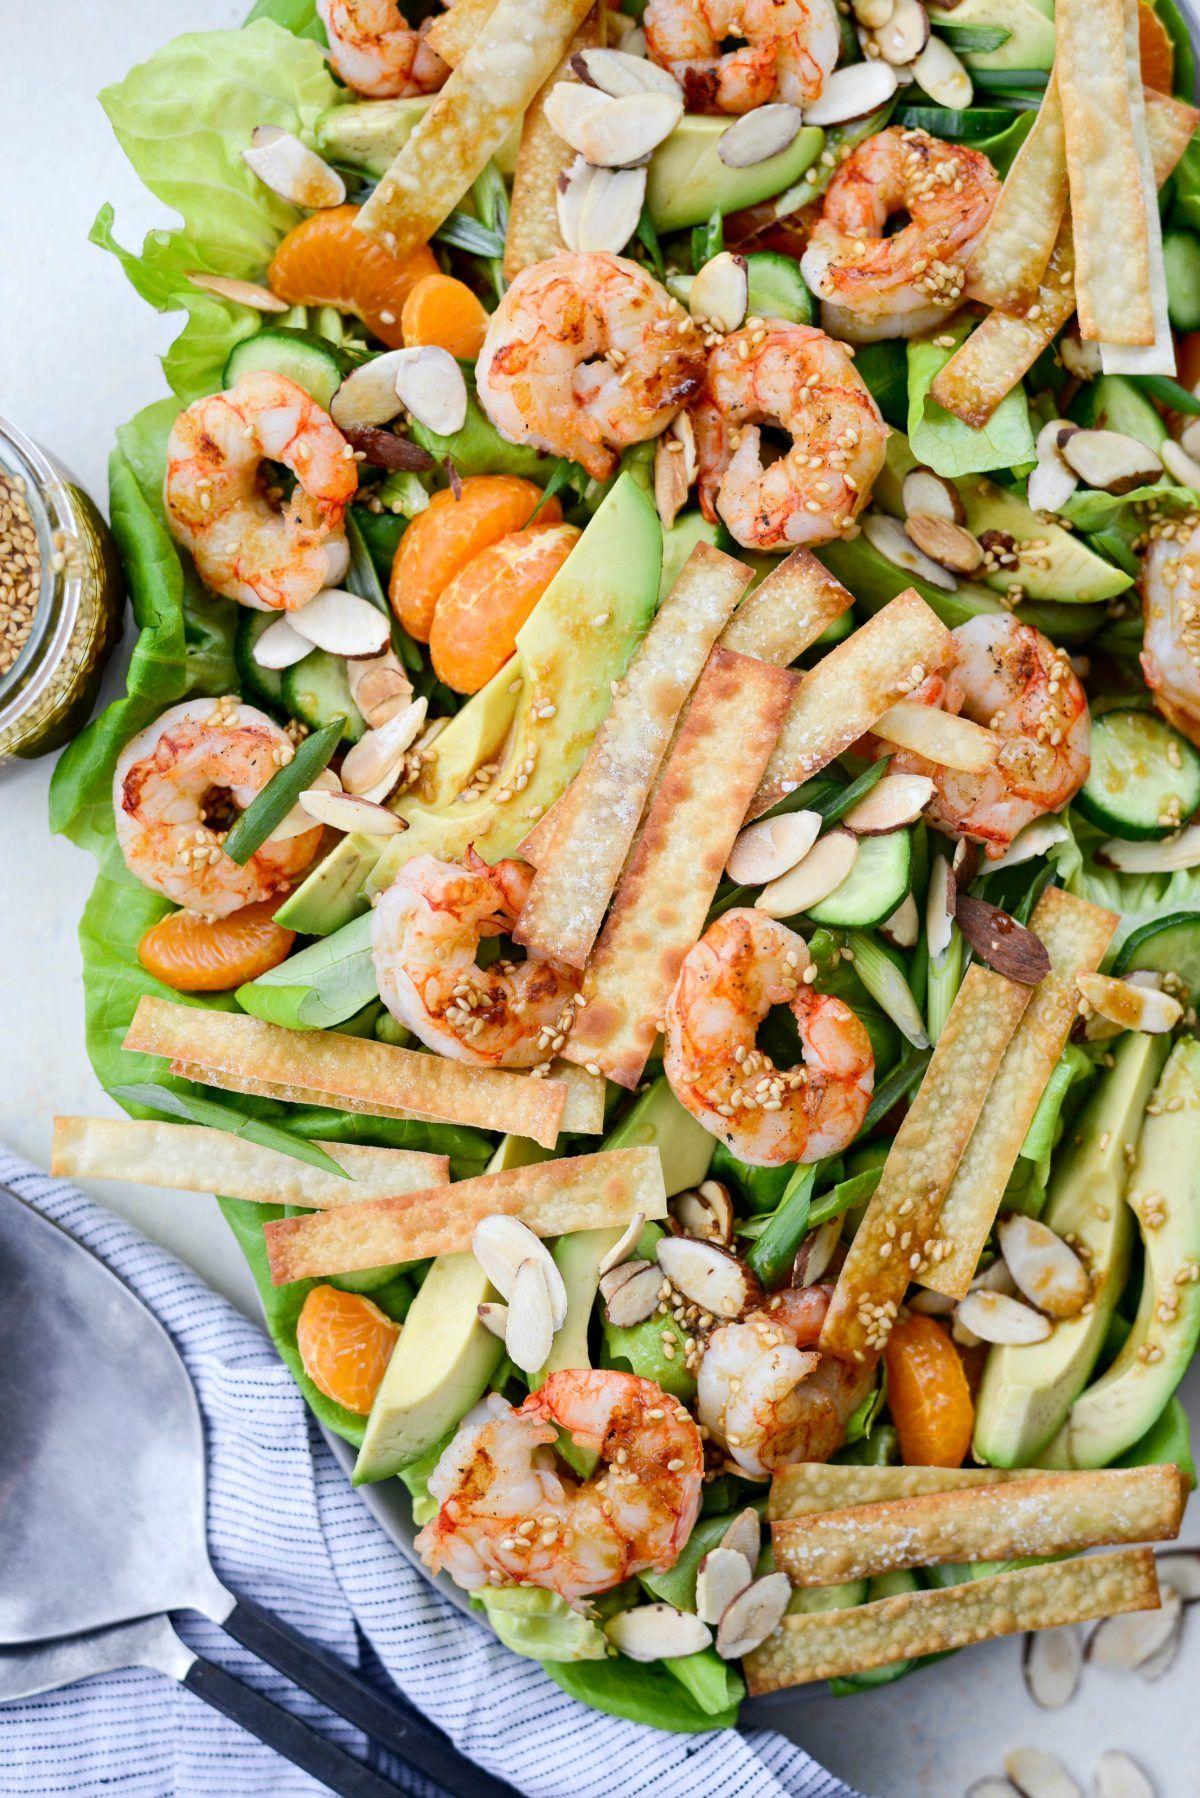 Shrimp Salad Recipes From Scratch